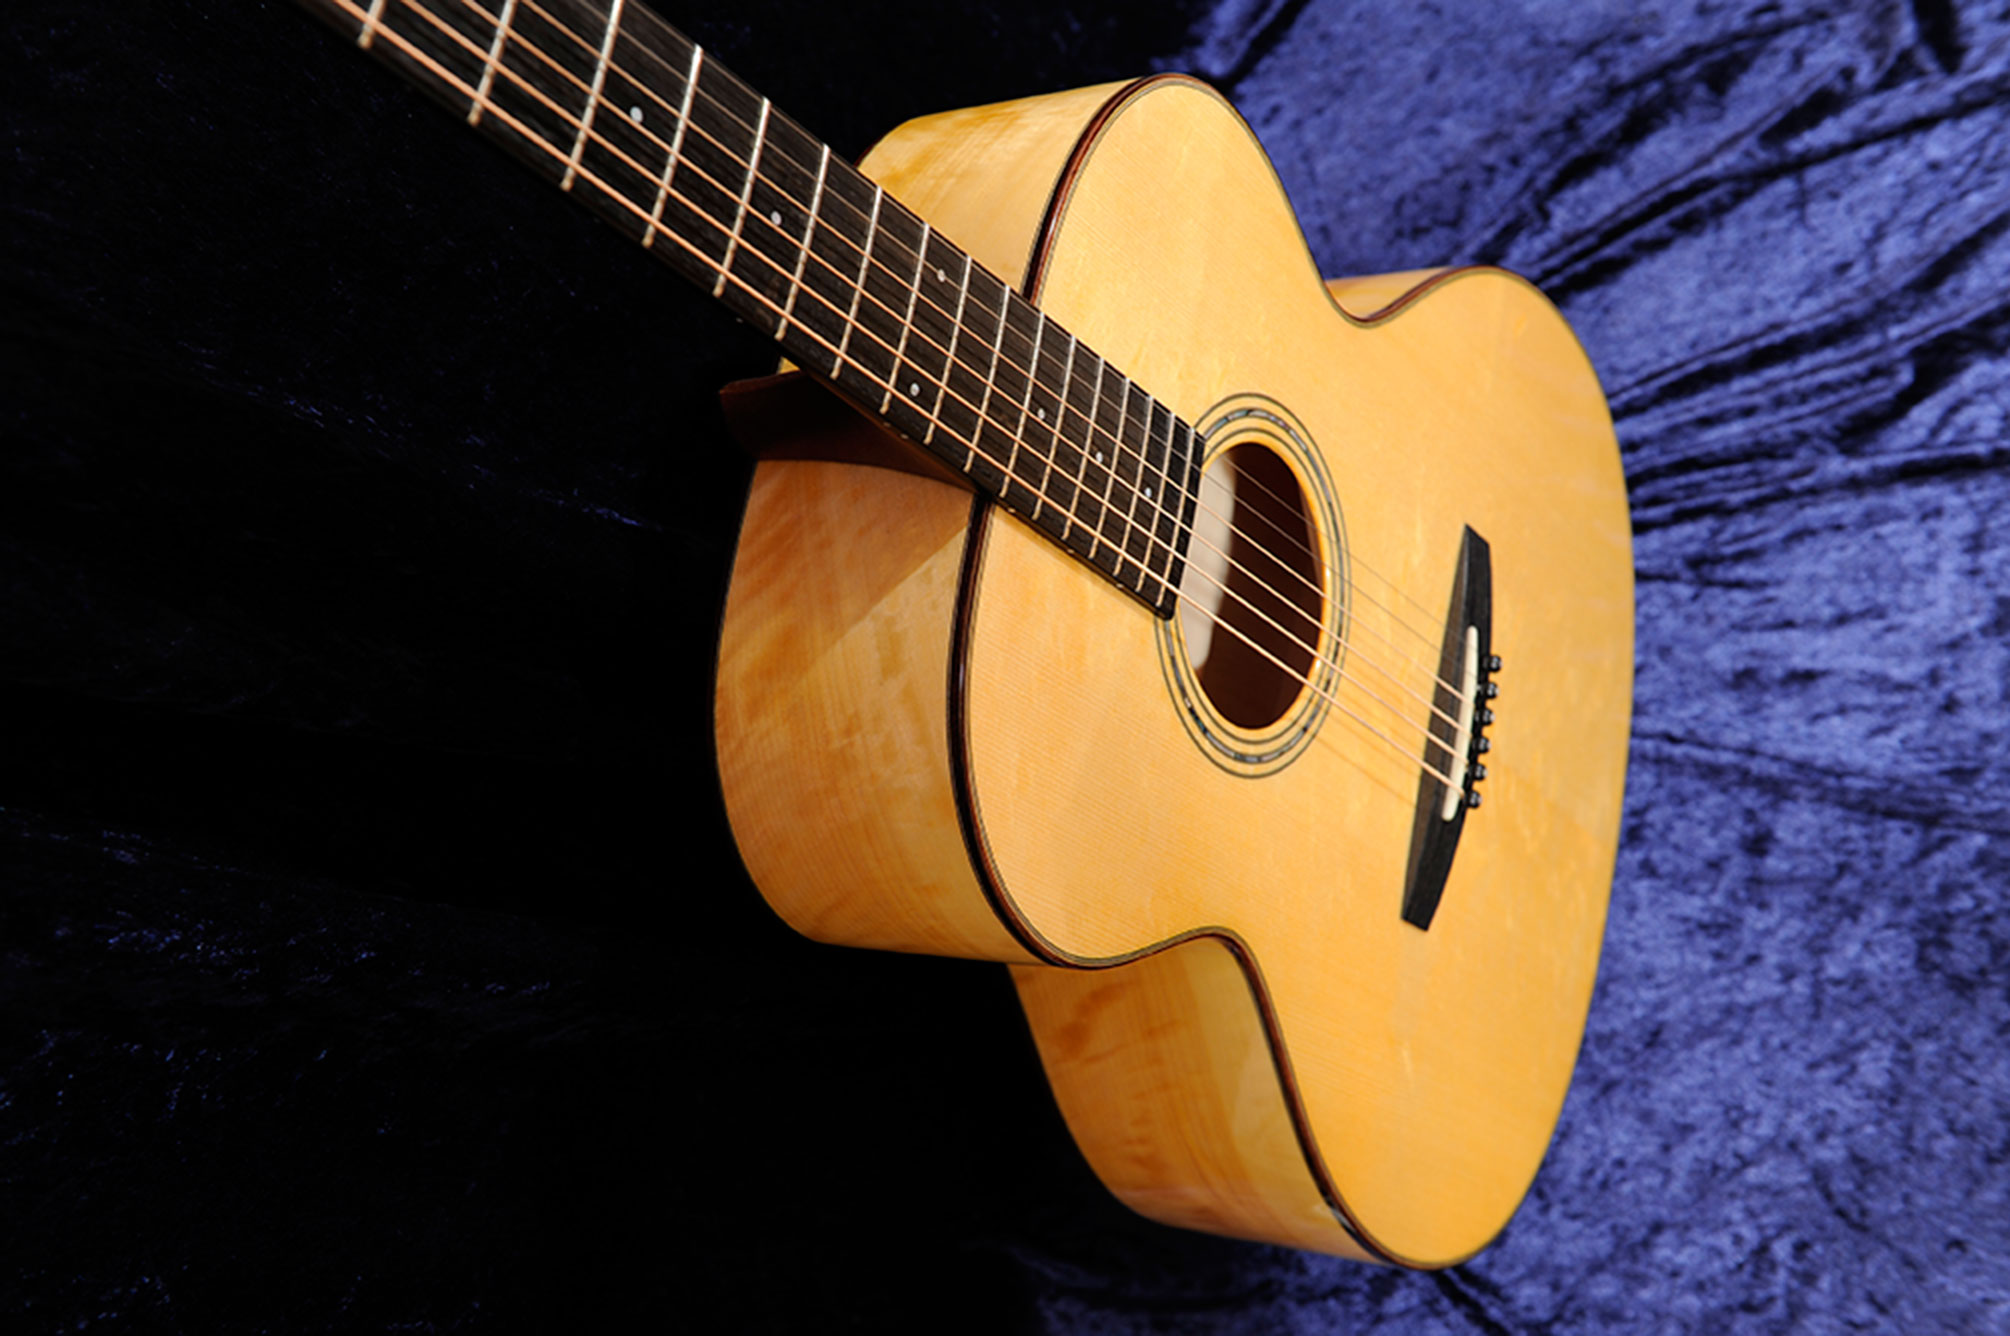 Meigel Handcrafted Guitars